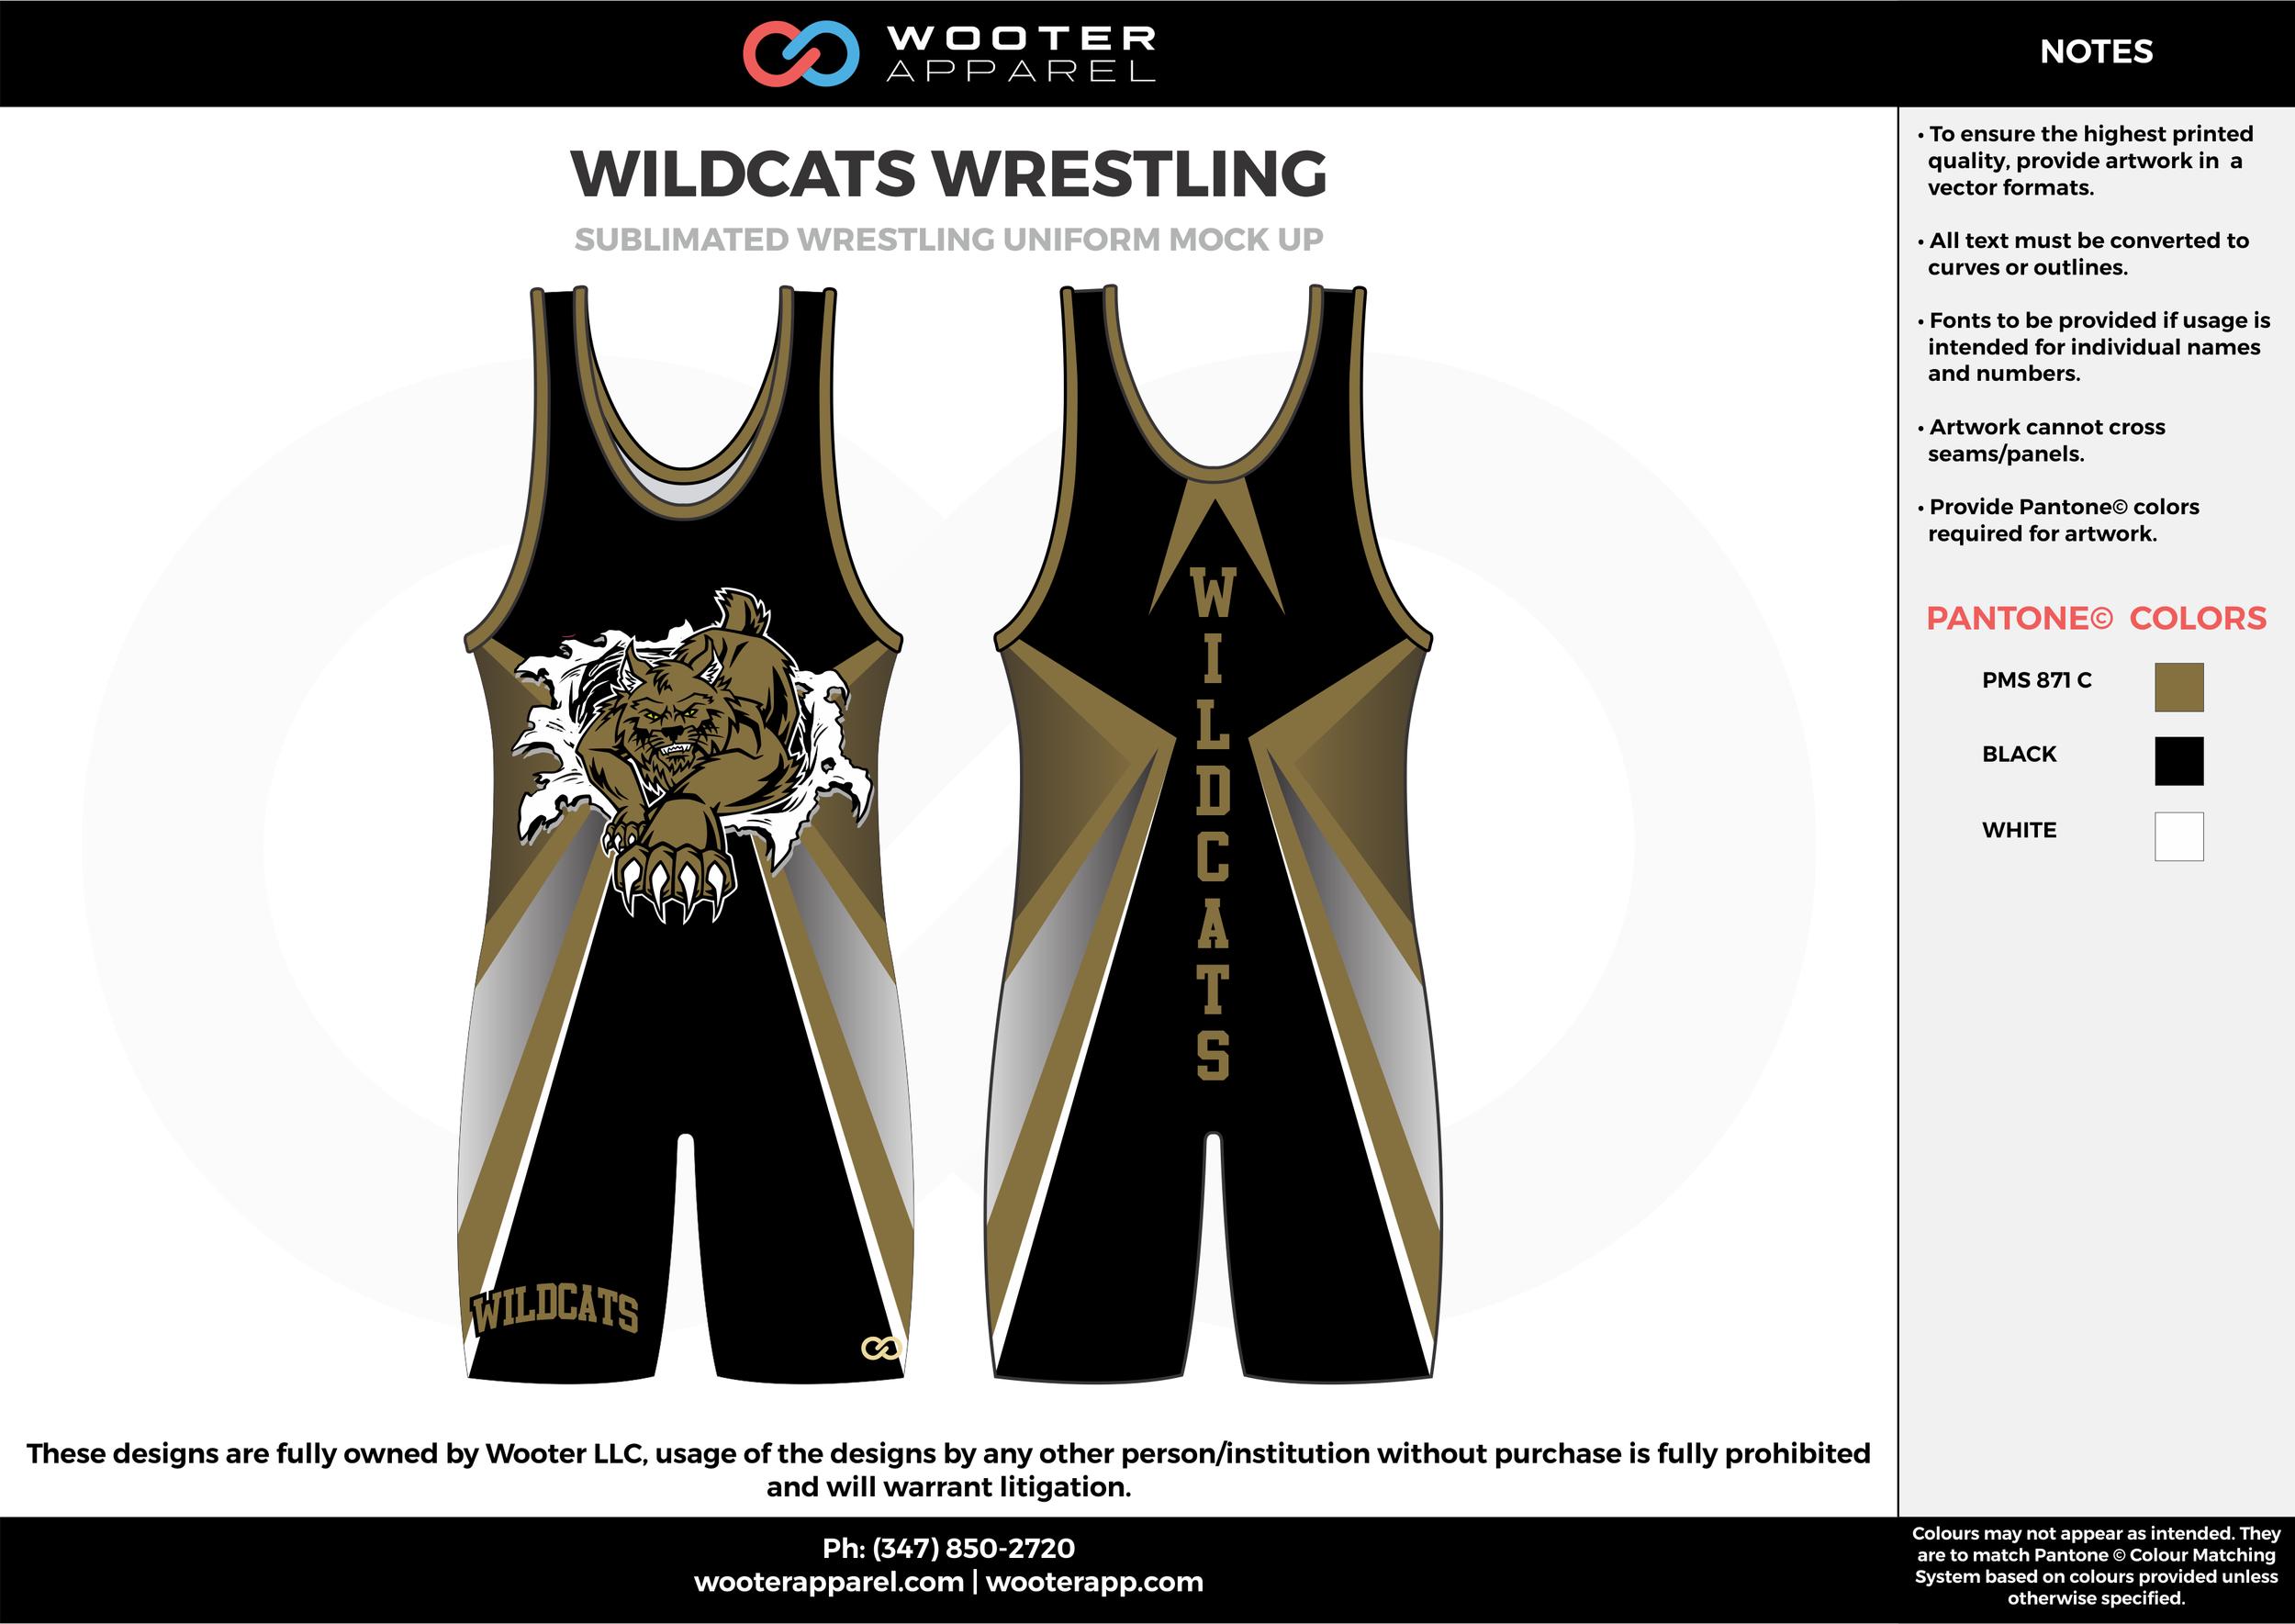 WILDCATS Black Brown White Sublimated Wrestling Uniform